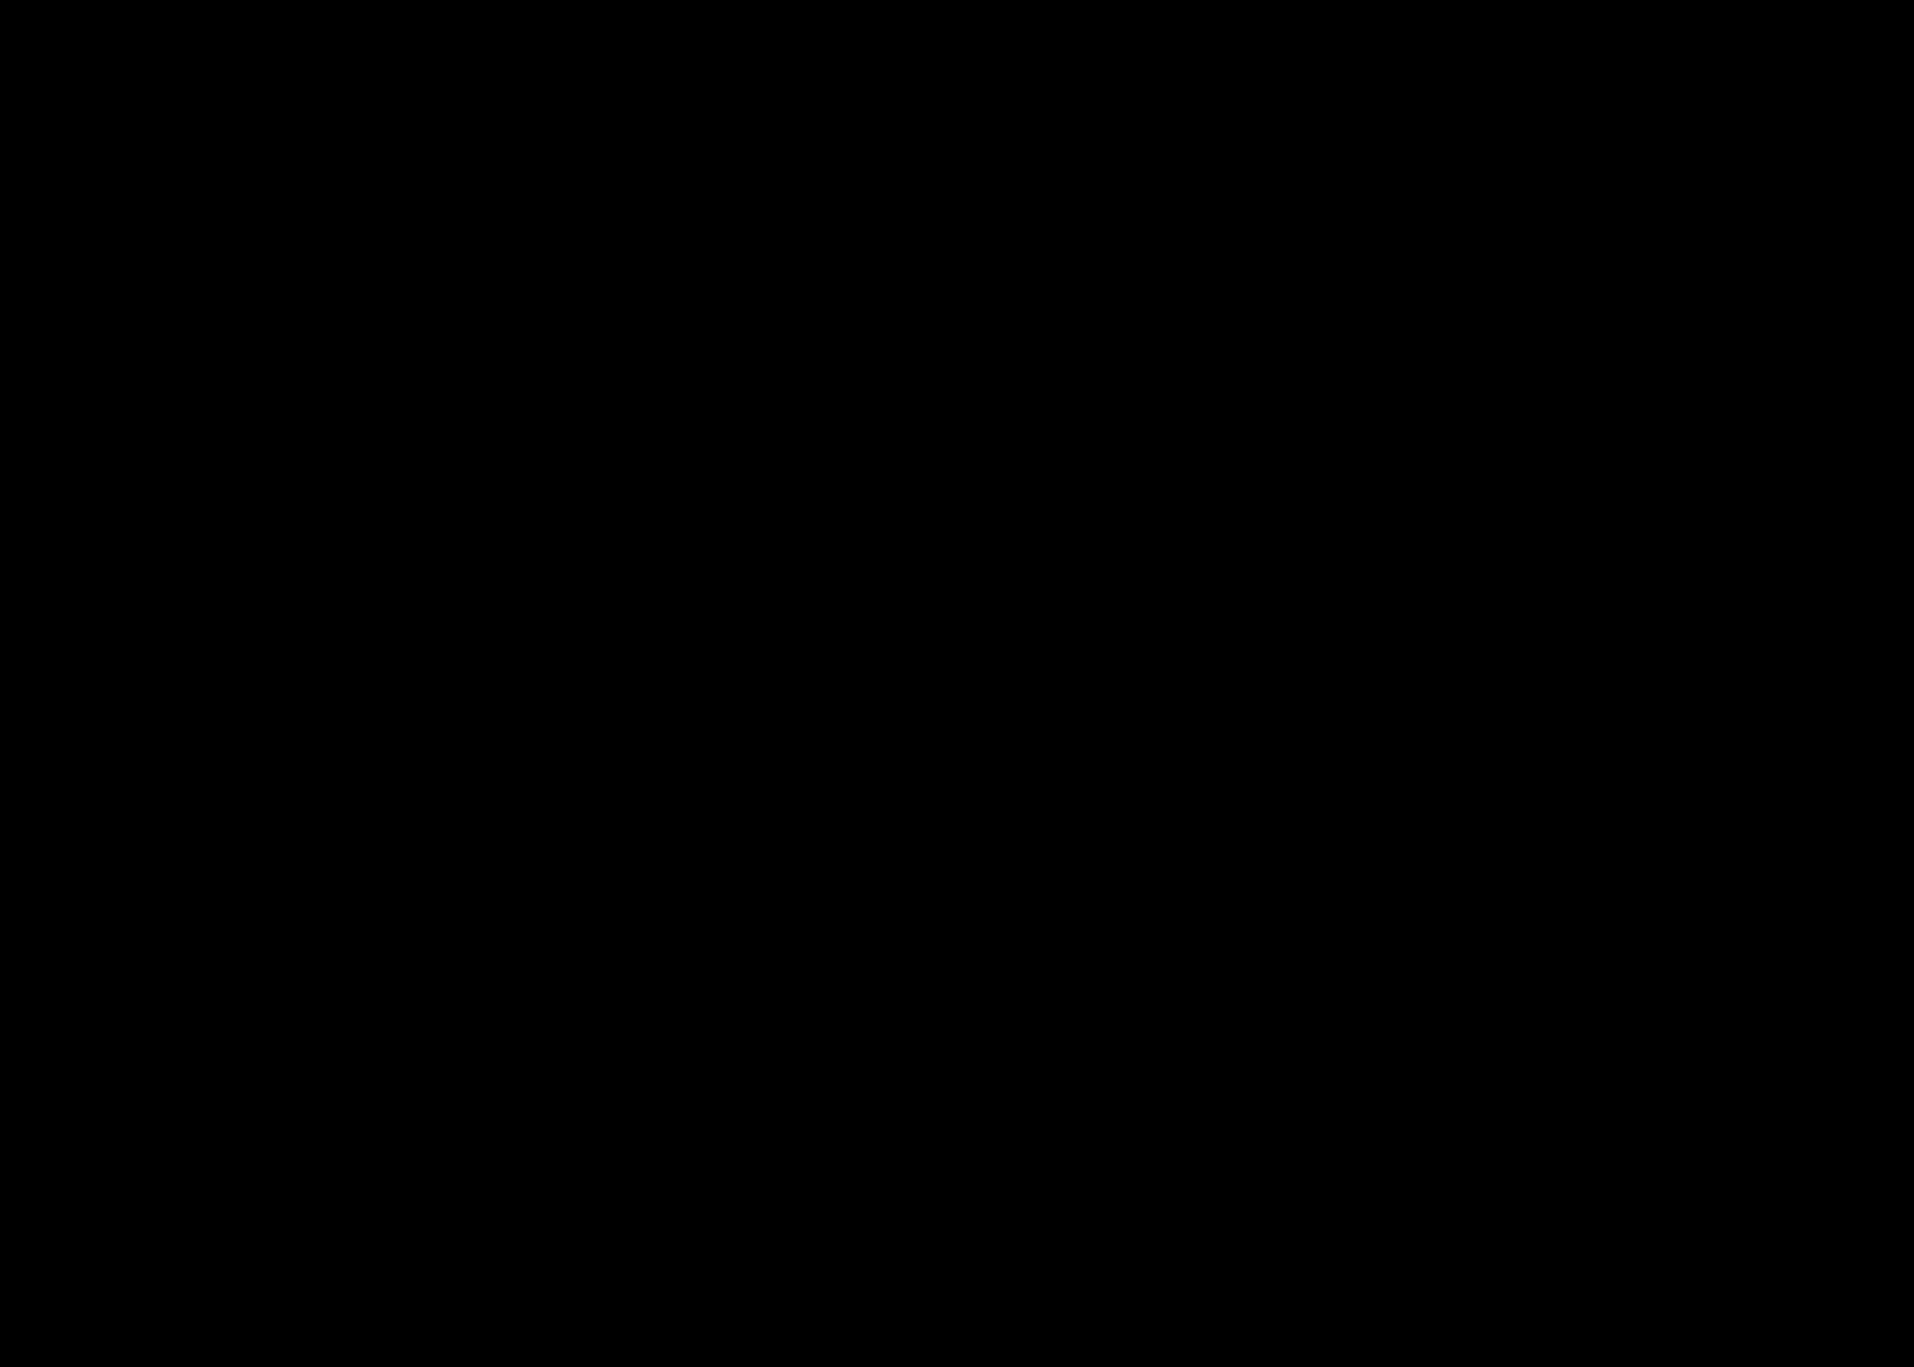 Видеорегистратор в зеркале SS01 DVR